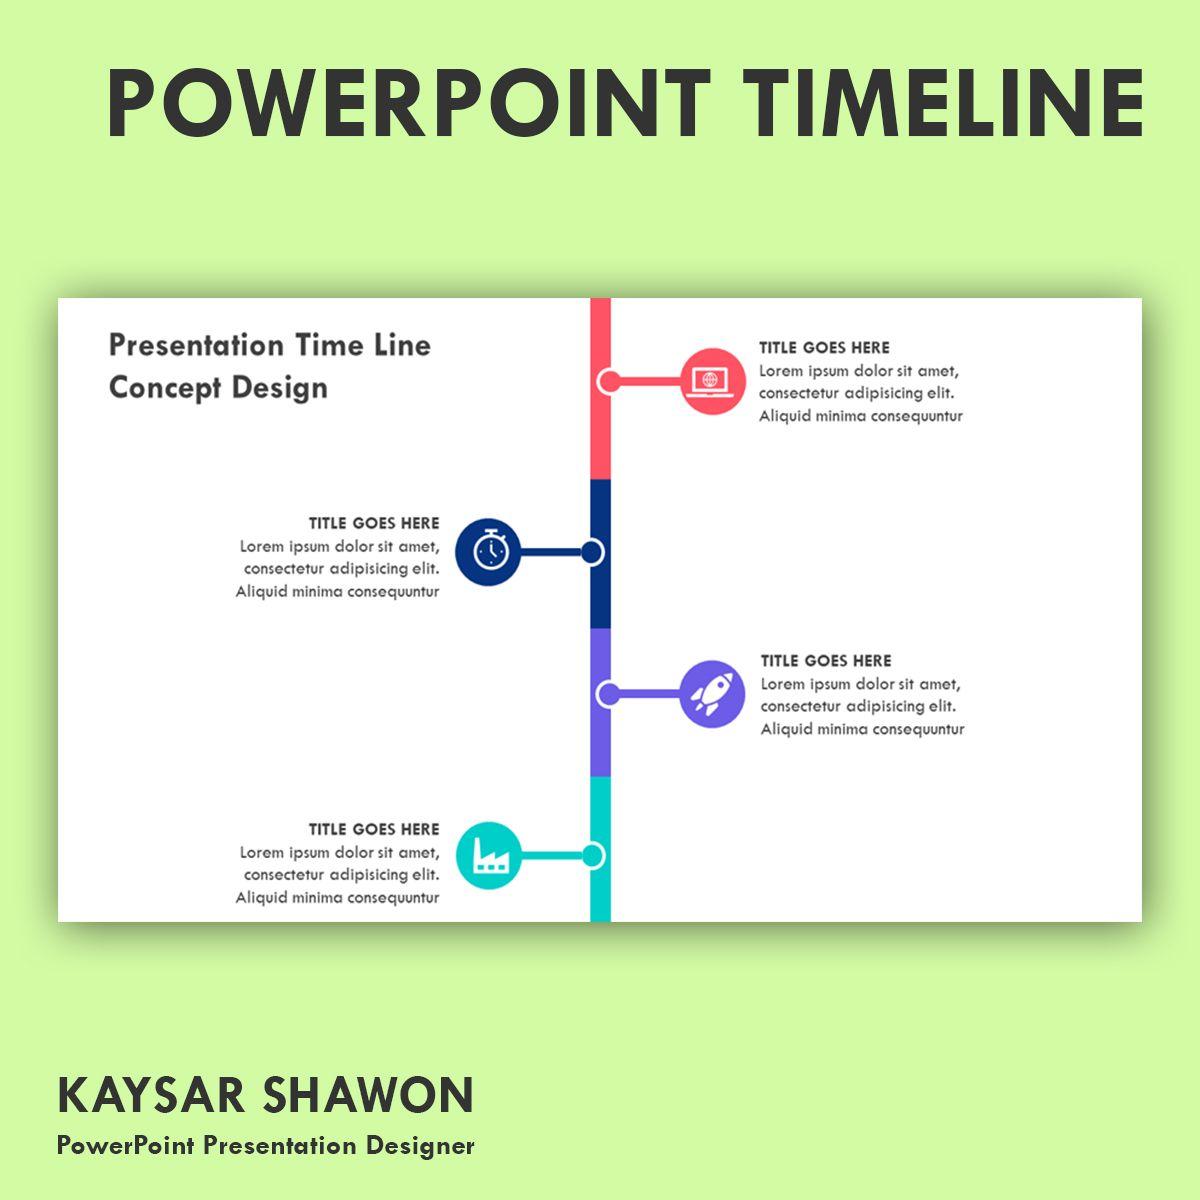 powerpoint timeline design personal presentation